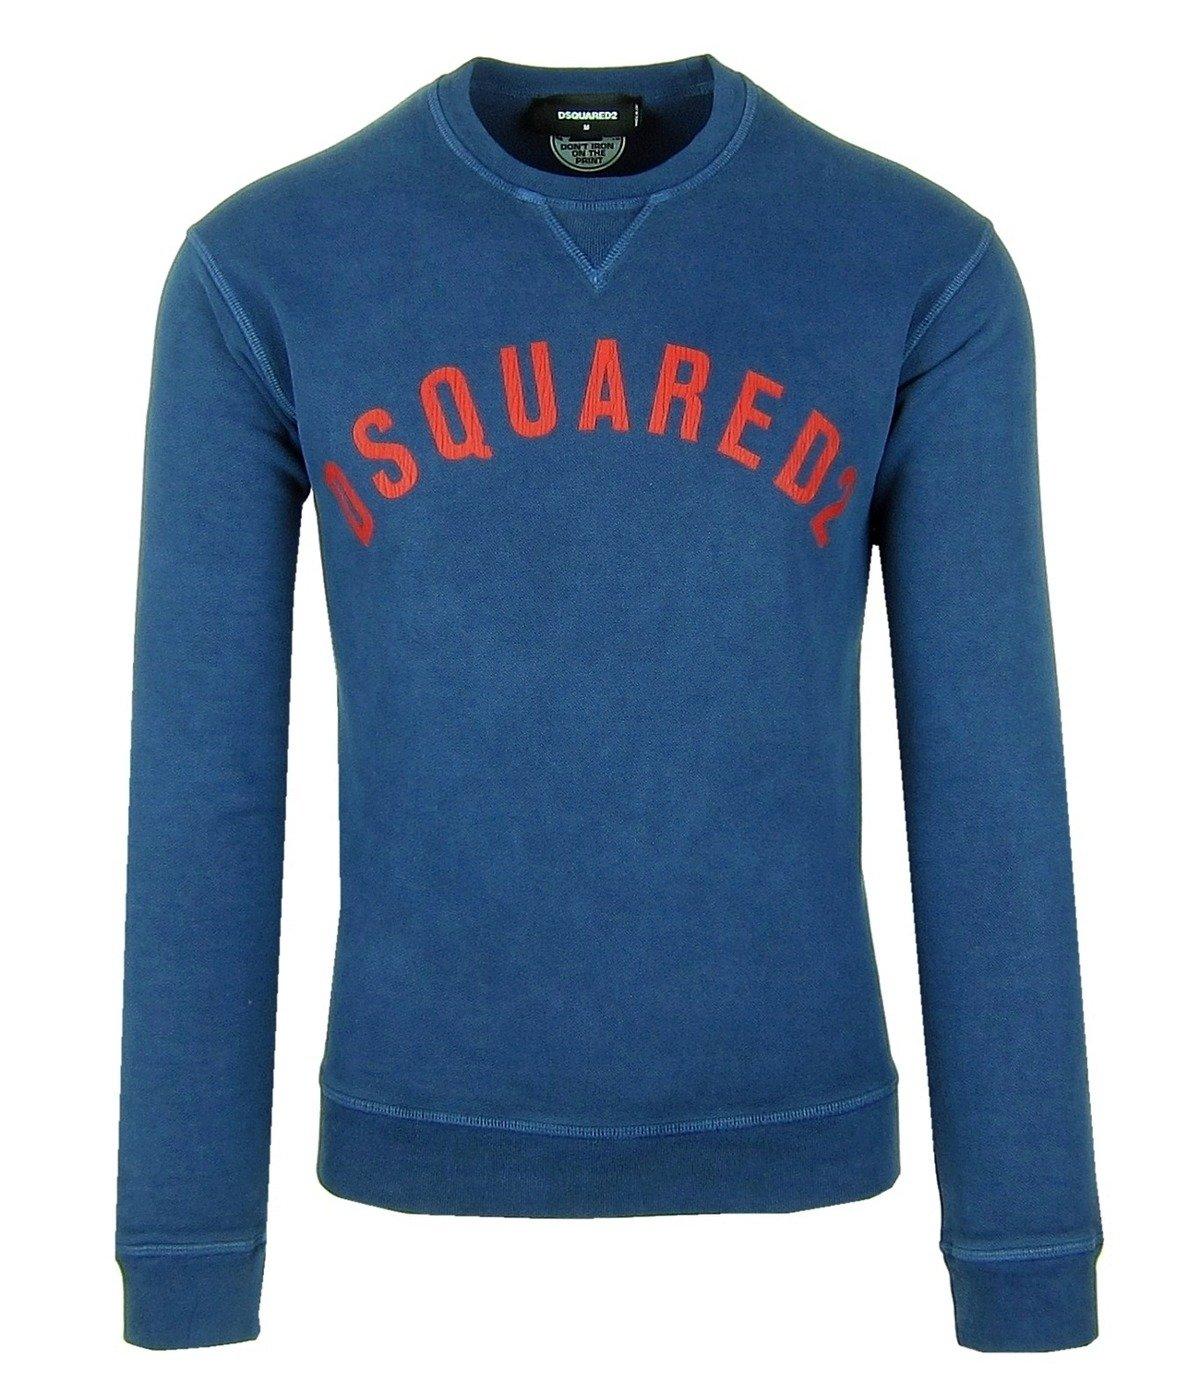 DSQUARED2 S74GU0155 Herren Men Pullover Sweatshirt Blau Blue